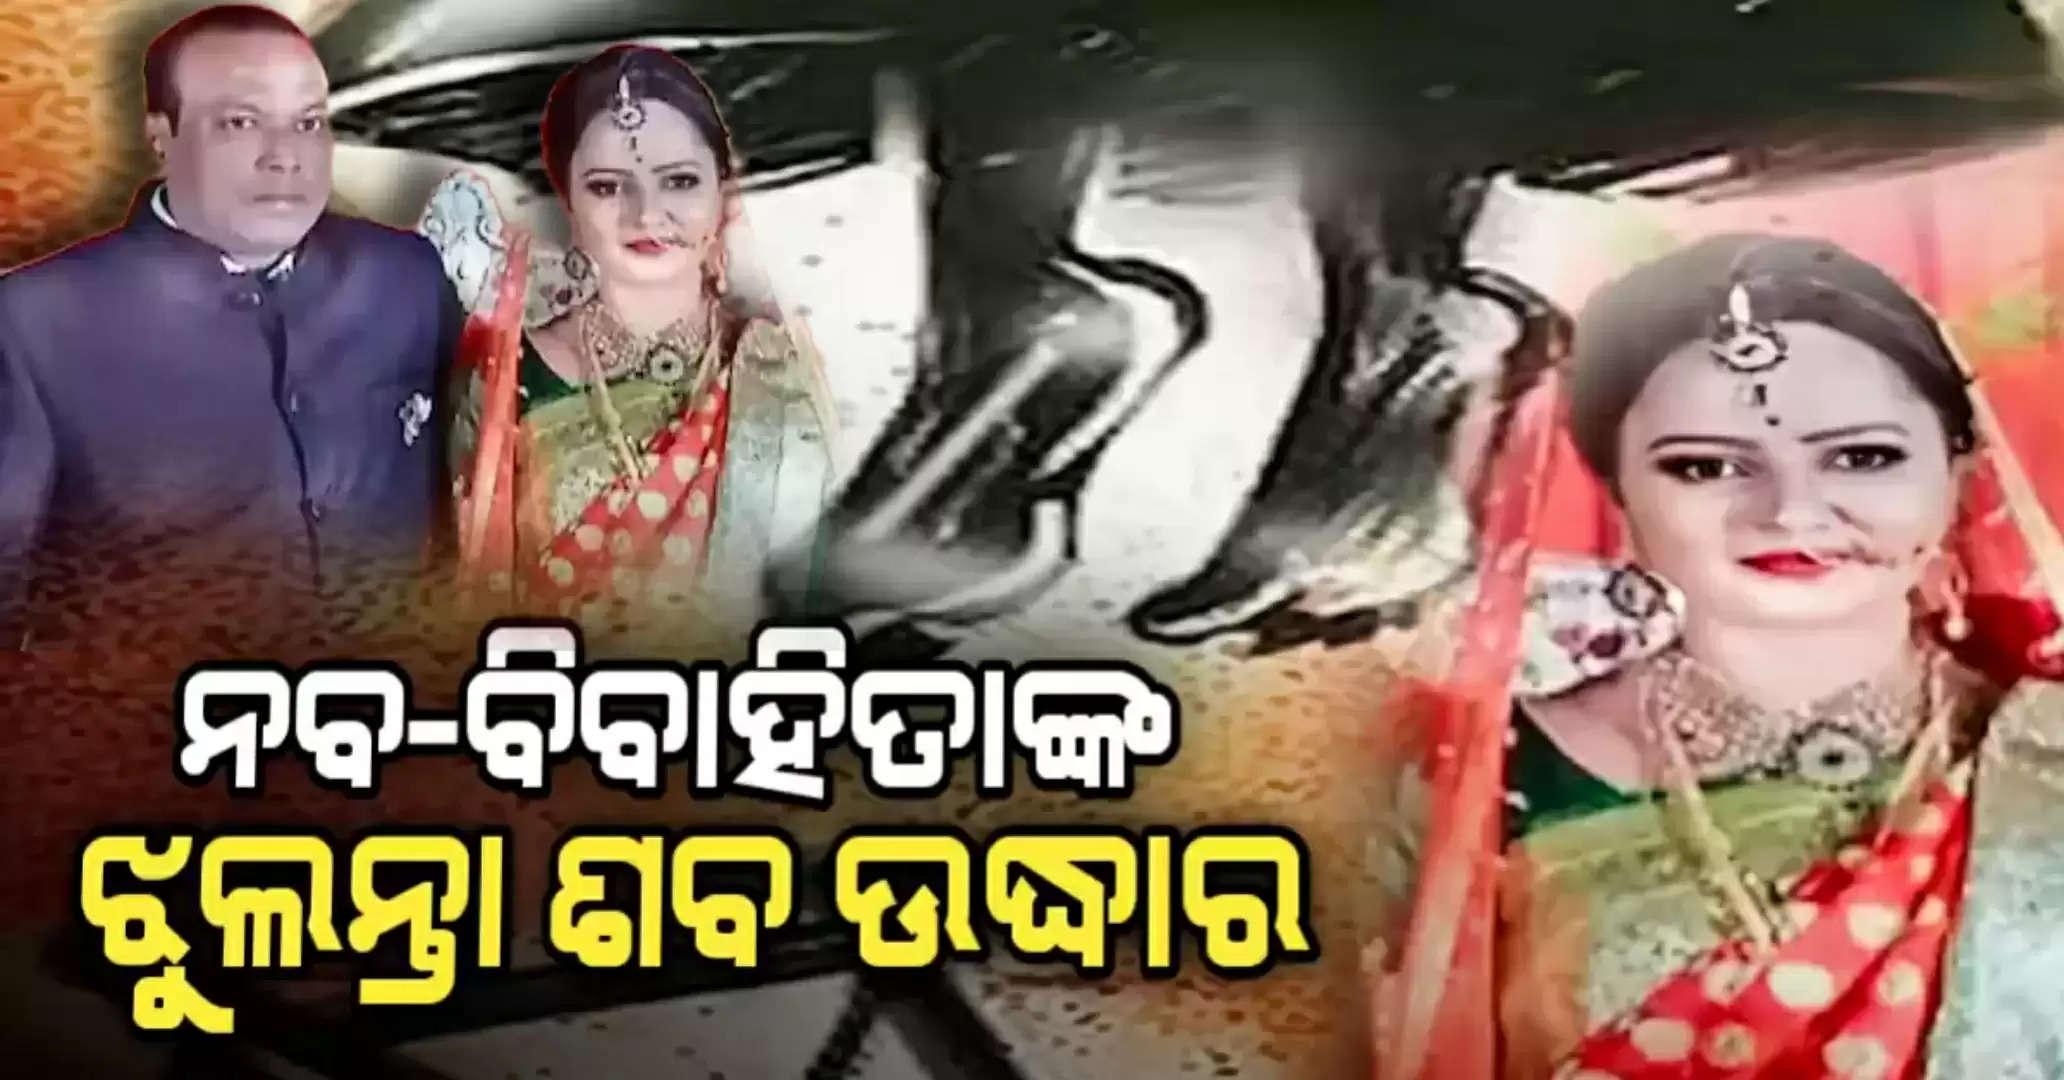 Nababadhu murtyu